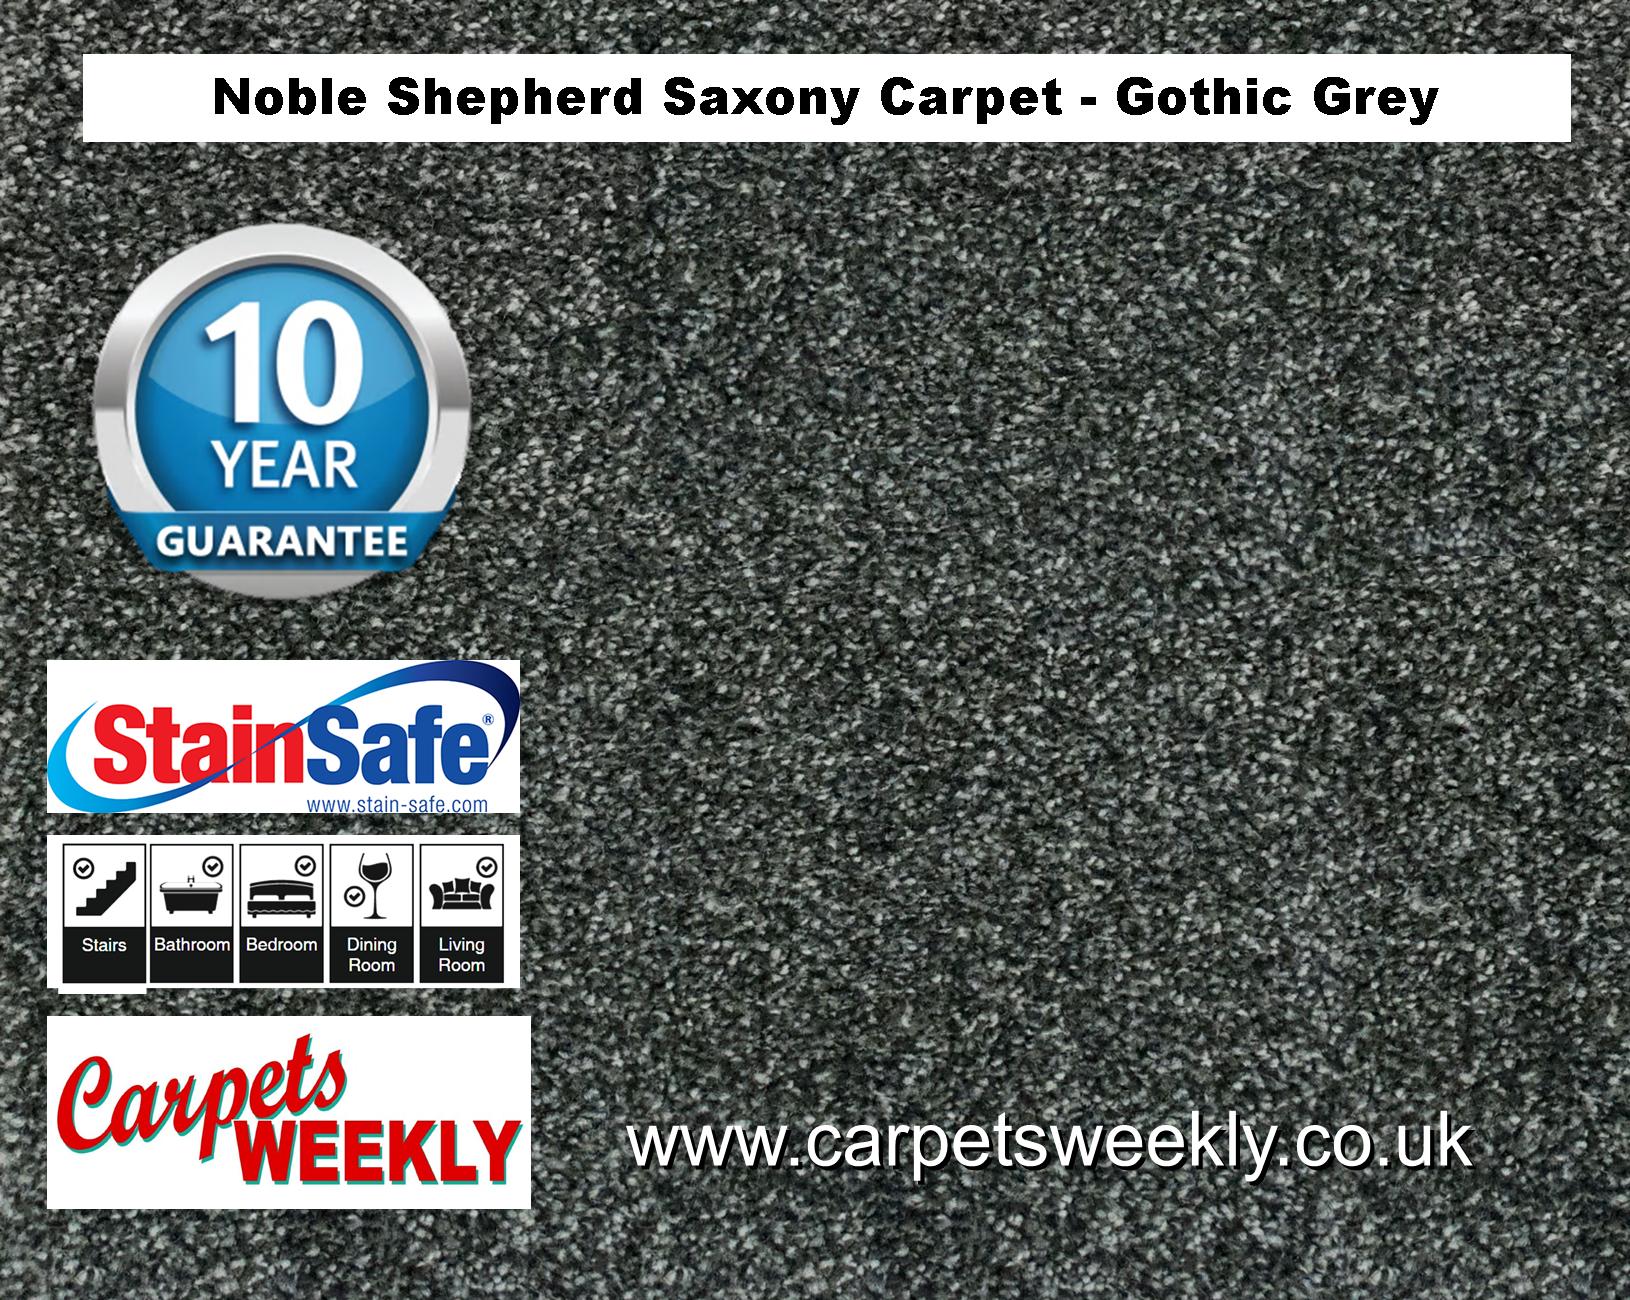 Noble Shepherd Saxony Carpet from Carpets Weekly Gothic Grey Saxony Carpet